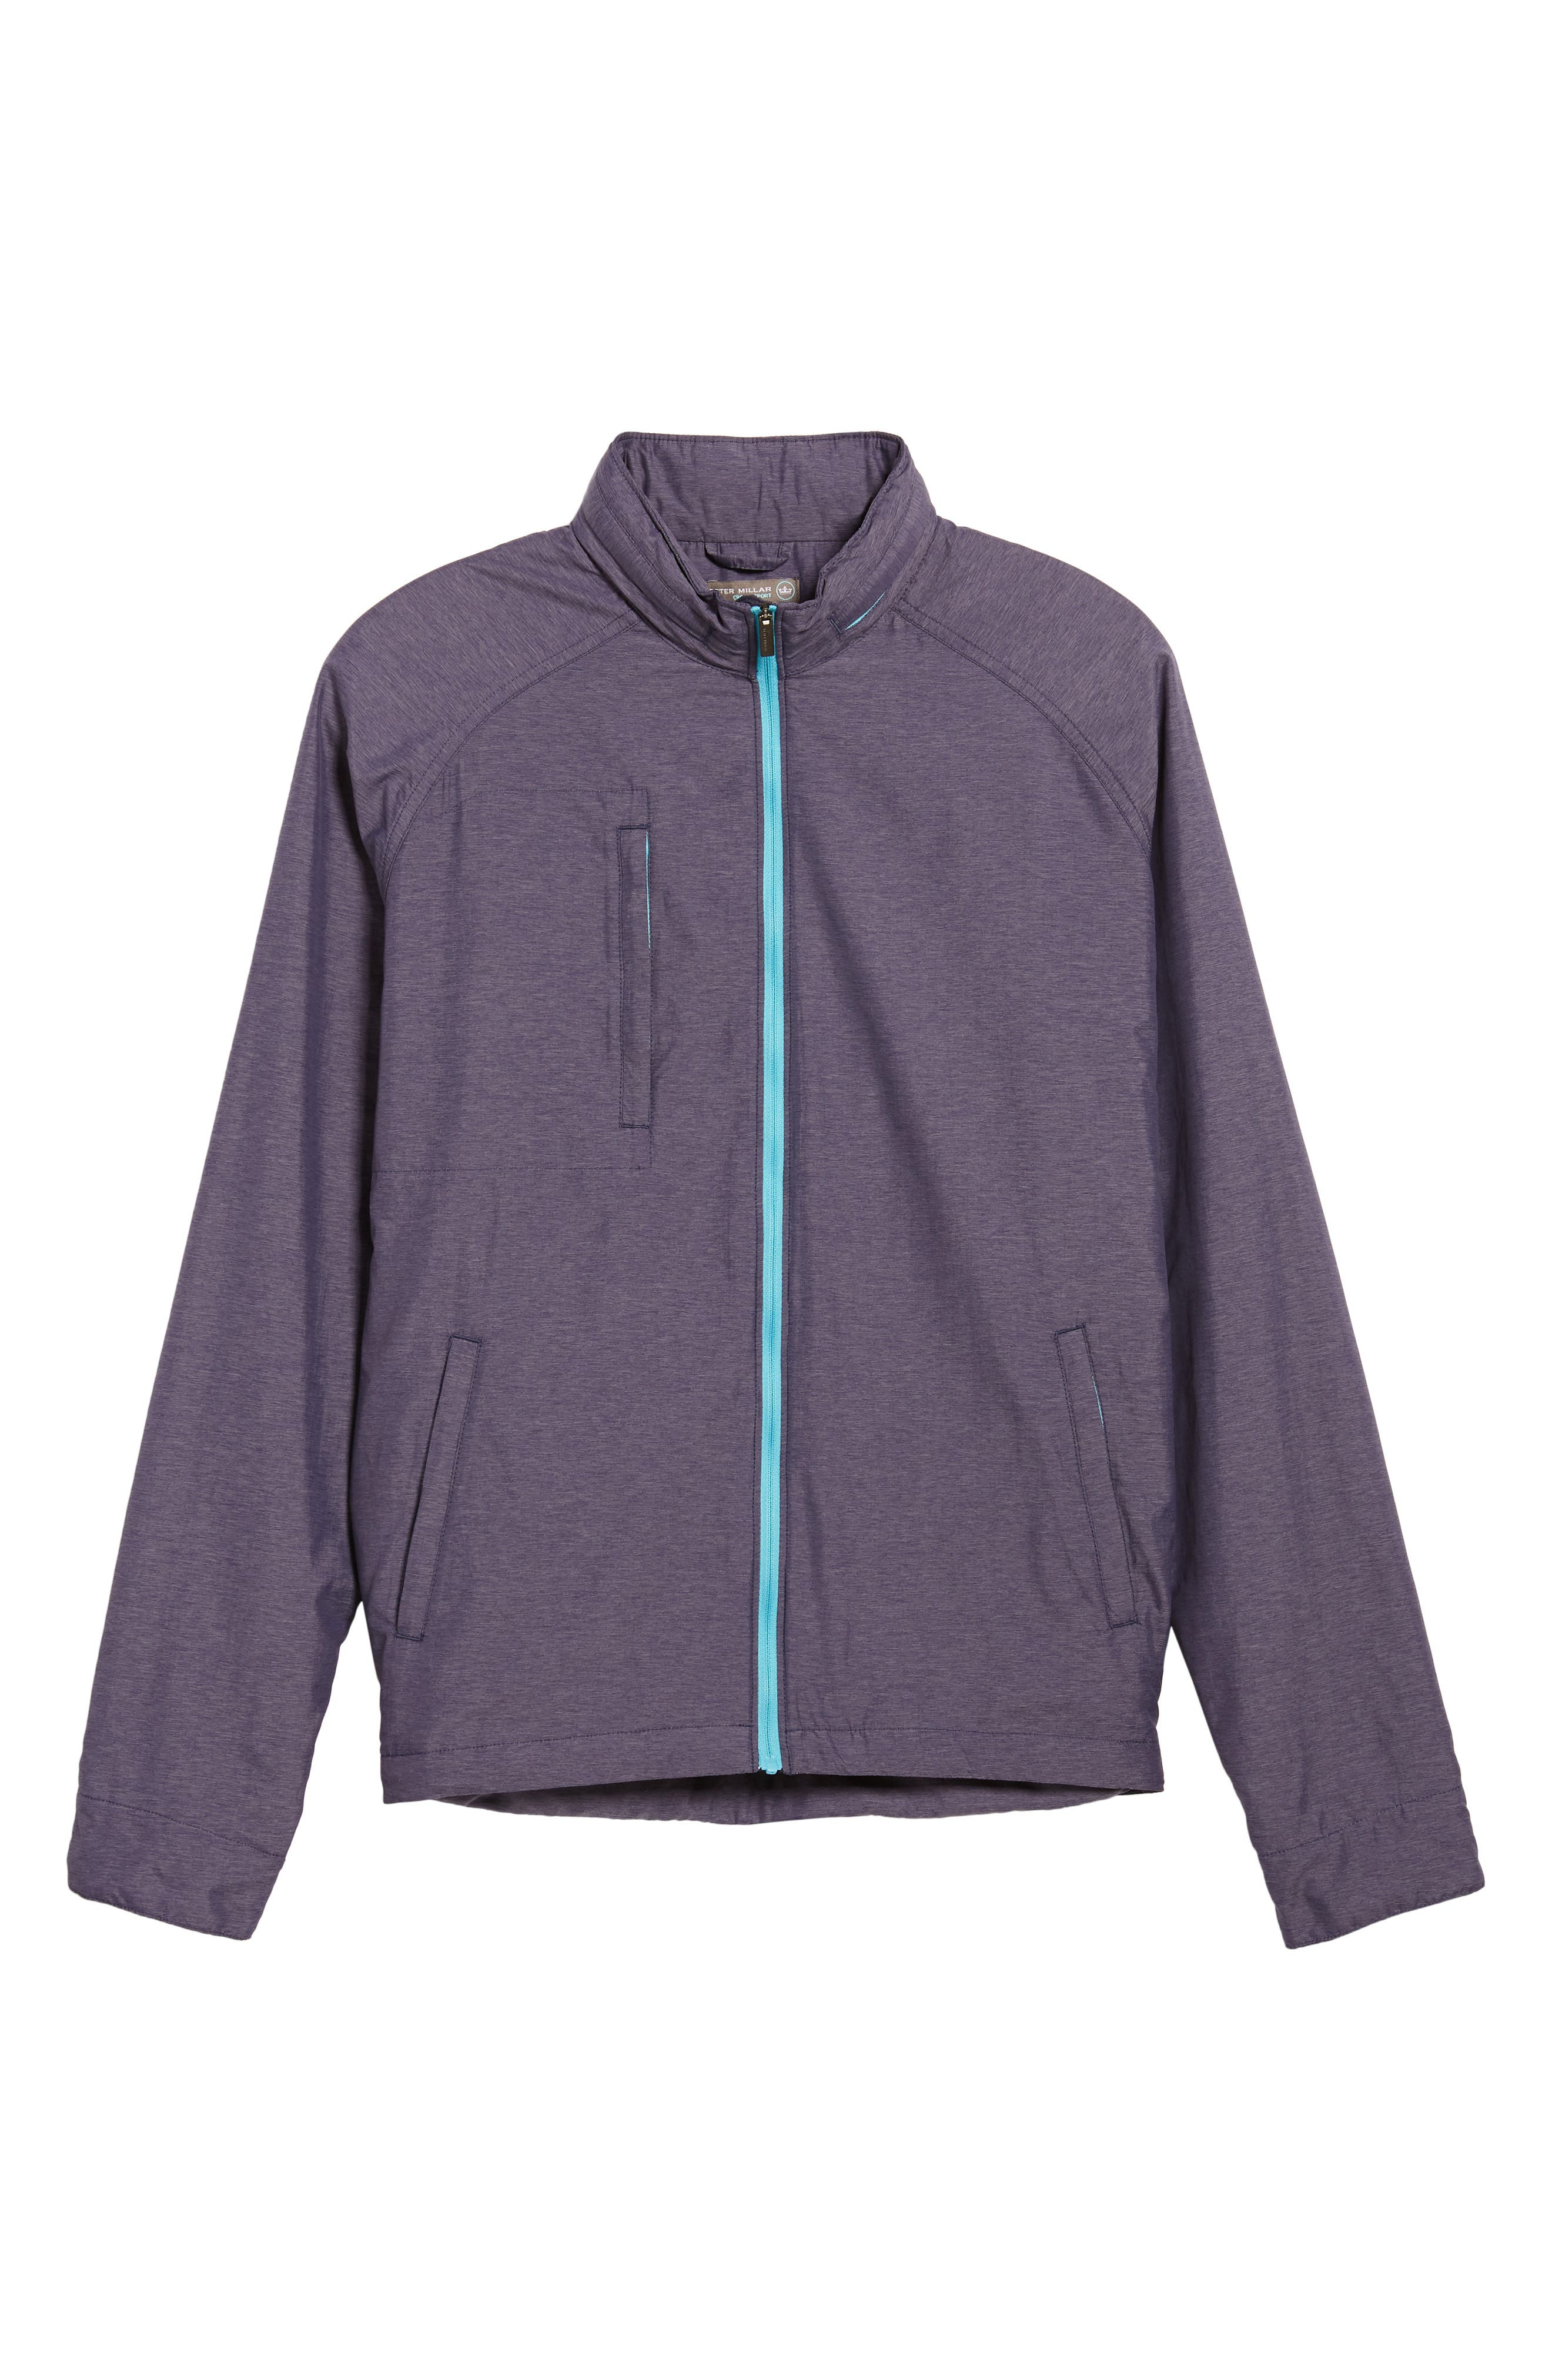 Nagano Windbreaker Jacket,                             Alternate thumbnail 10, color,